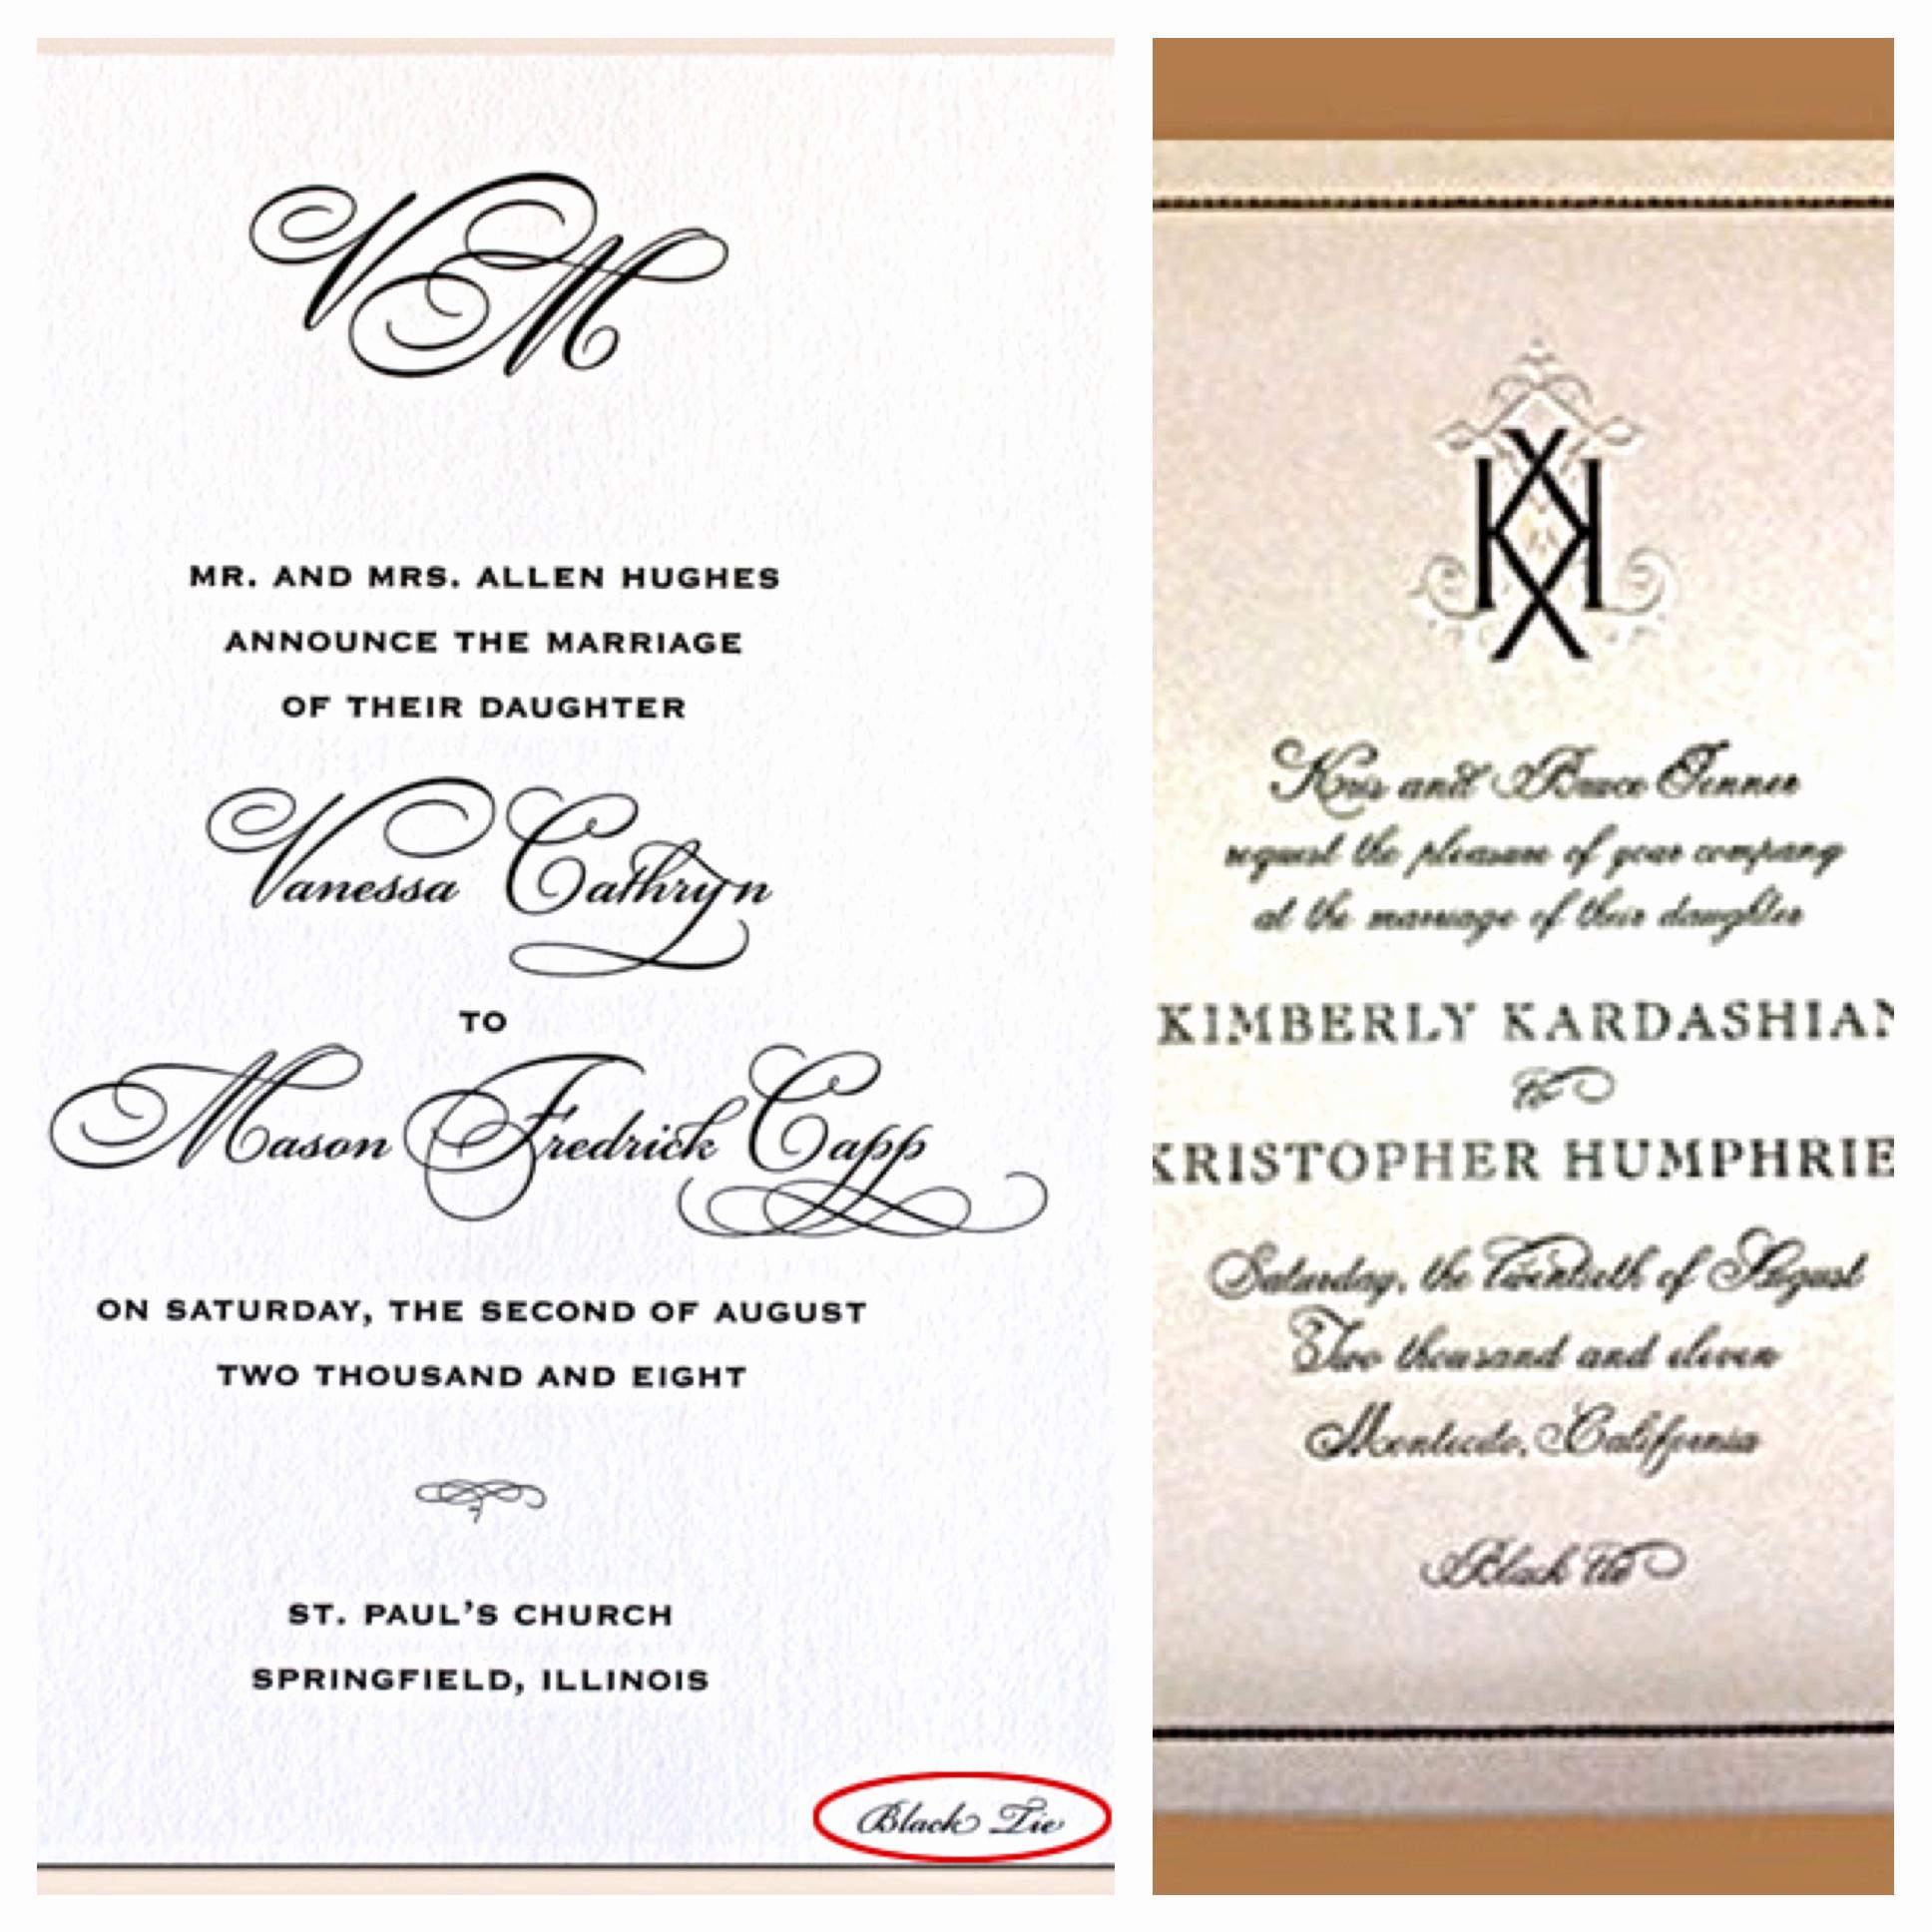 Invitation Dress Code Wording Beautiful Wedding Dress Codes Flair Boston